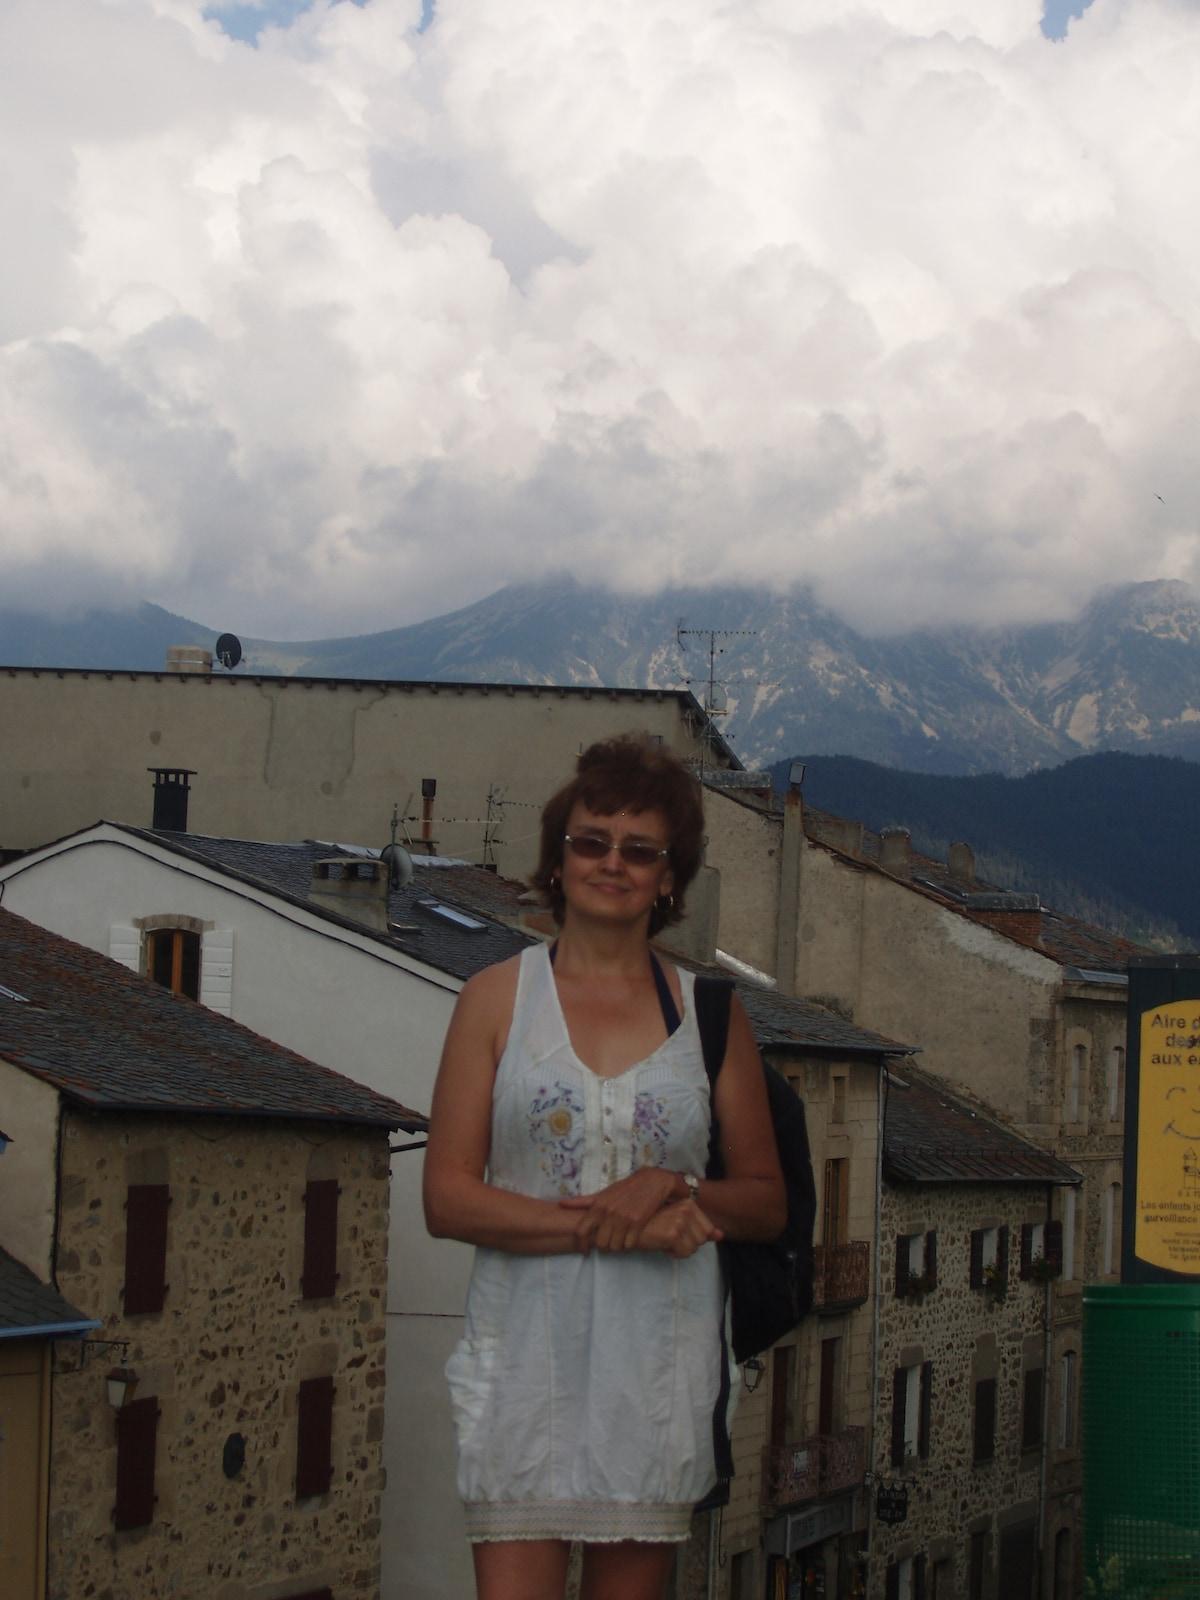 Anna from Prades